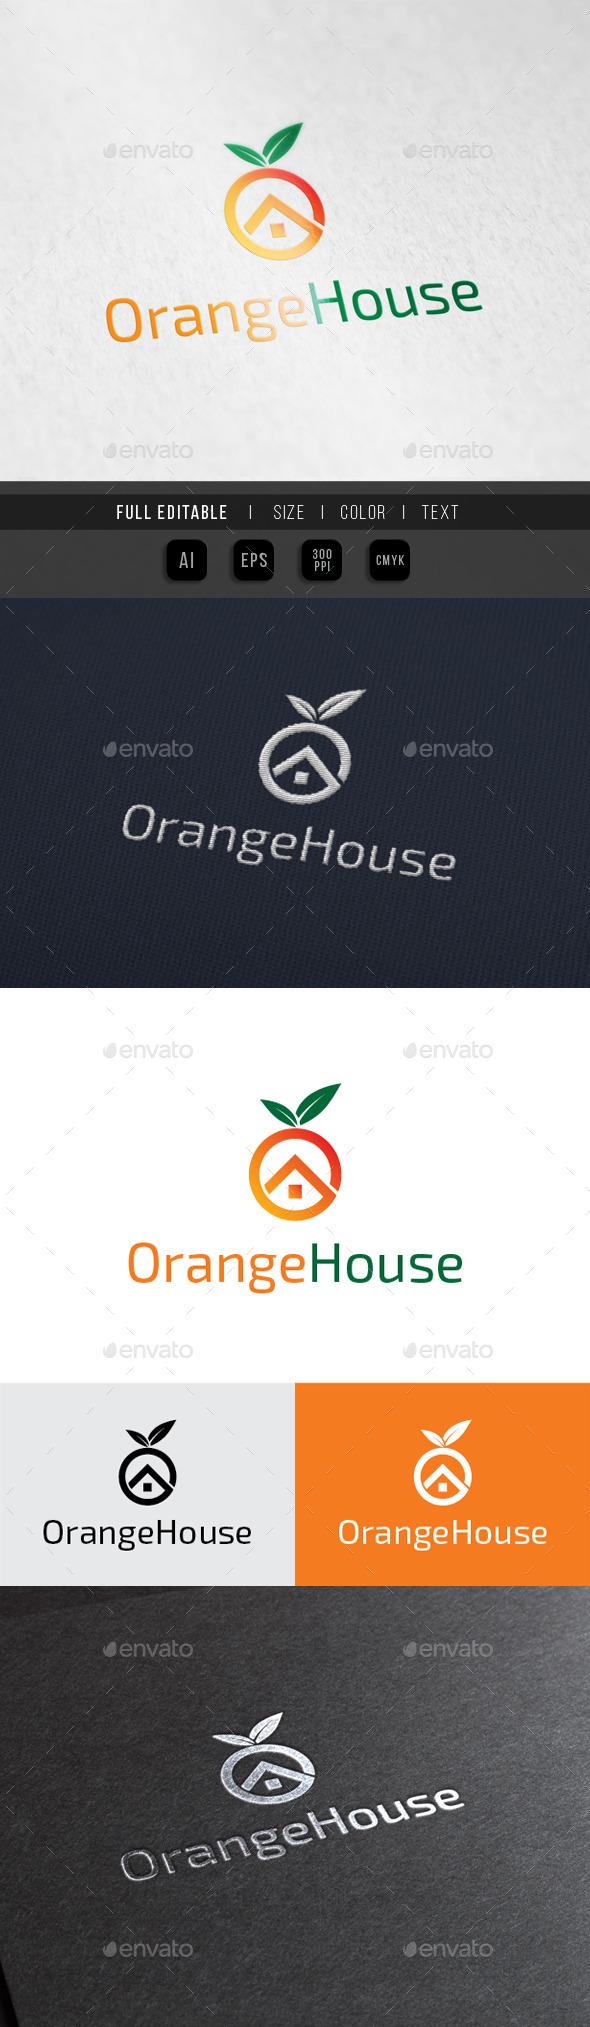 Orange House - Fruit Juice shop - Buildings Logo Templates